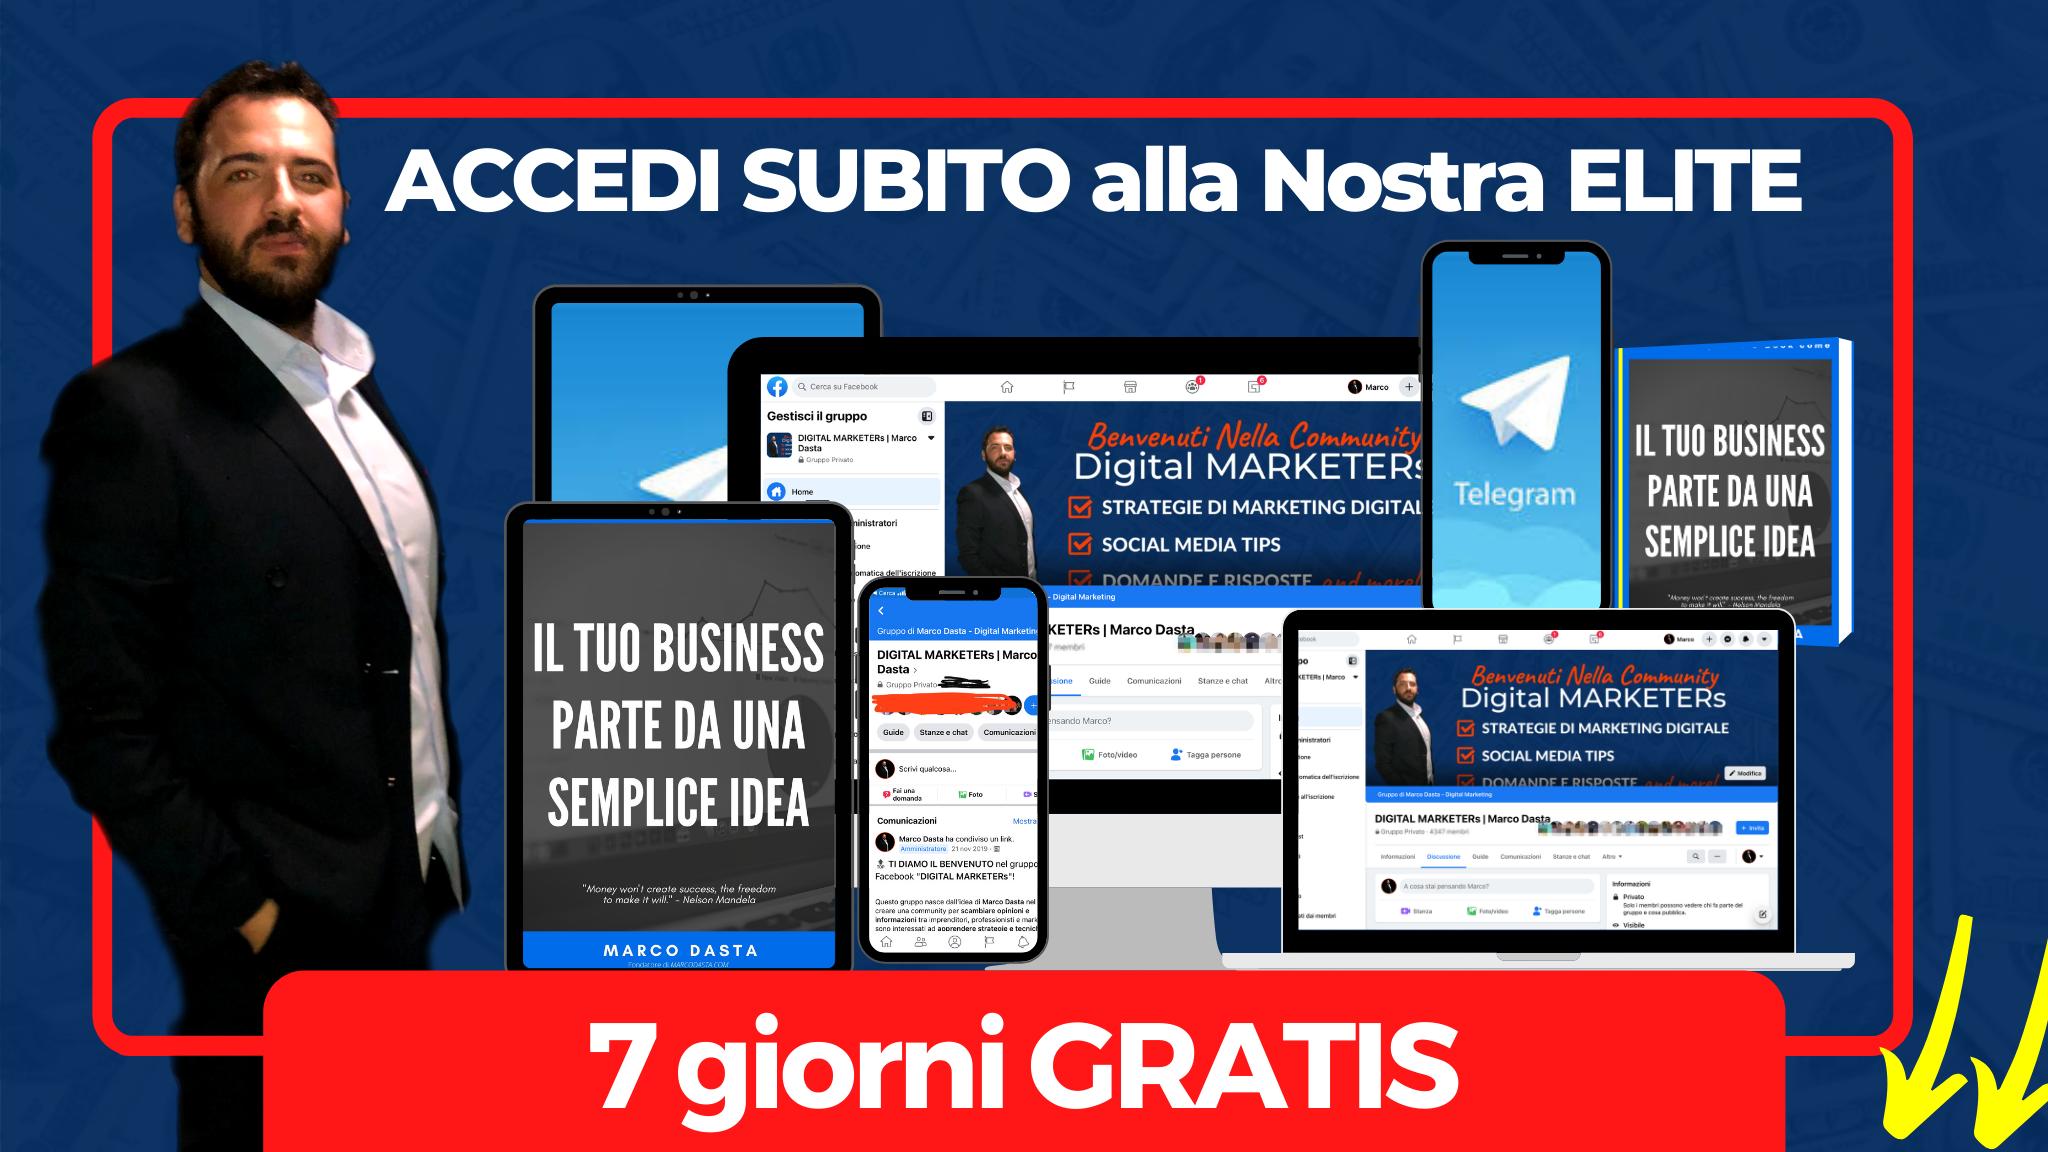 marketing strategico elite 7 giorni gratis